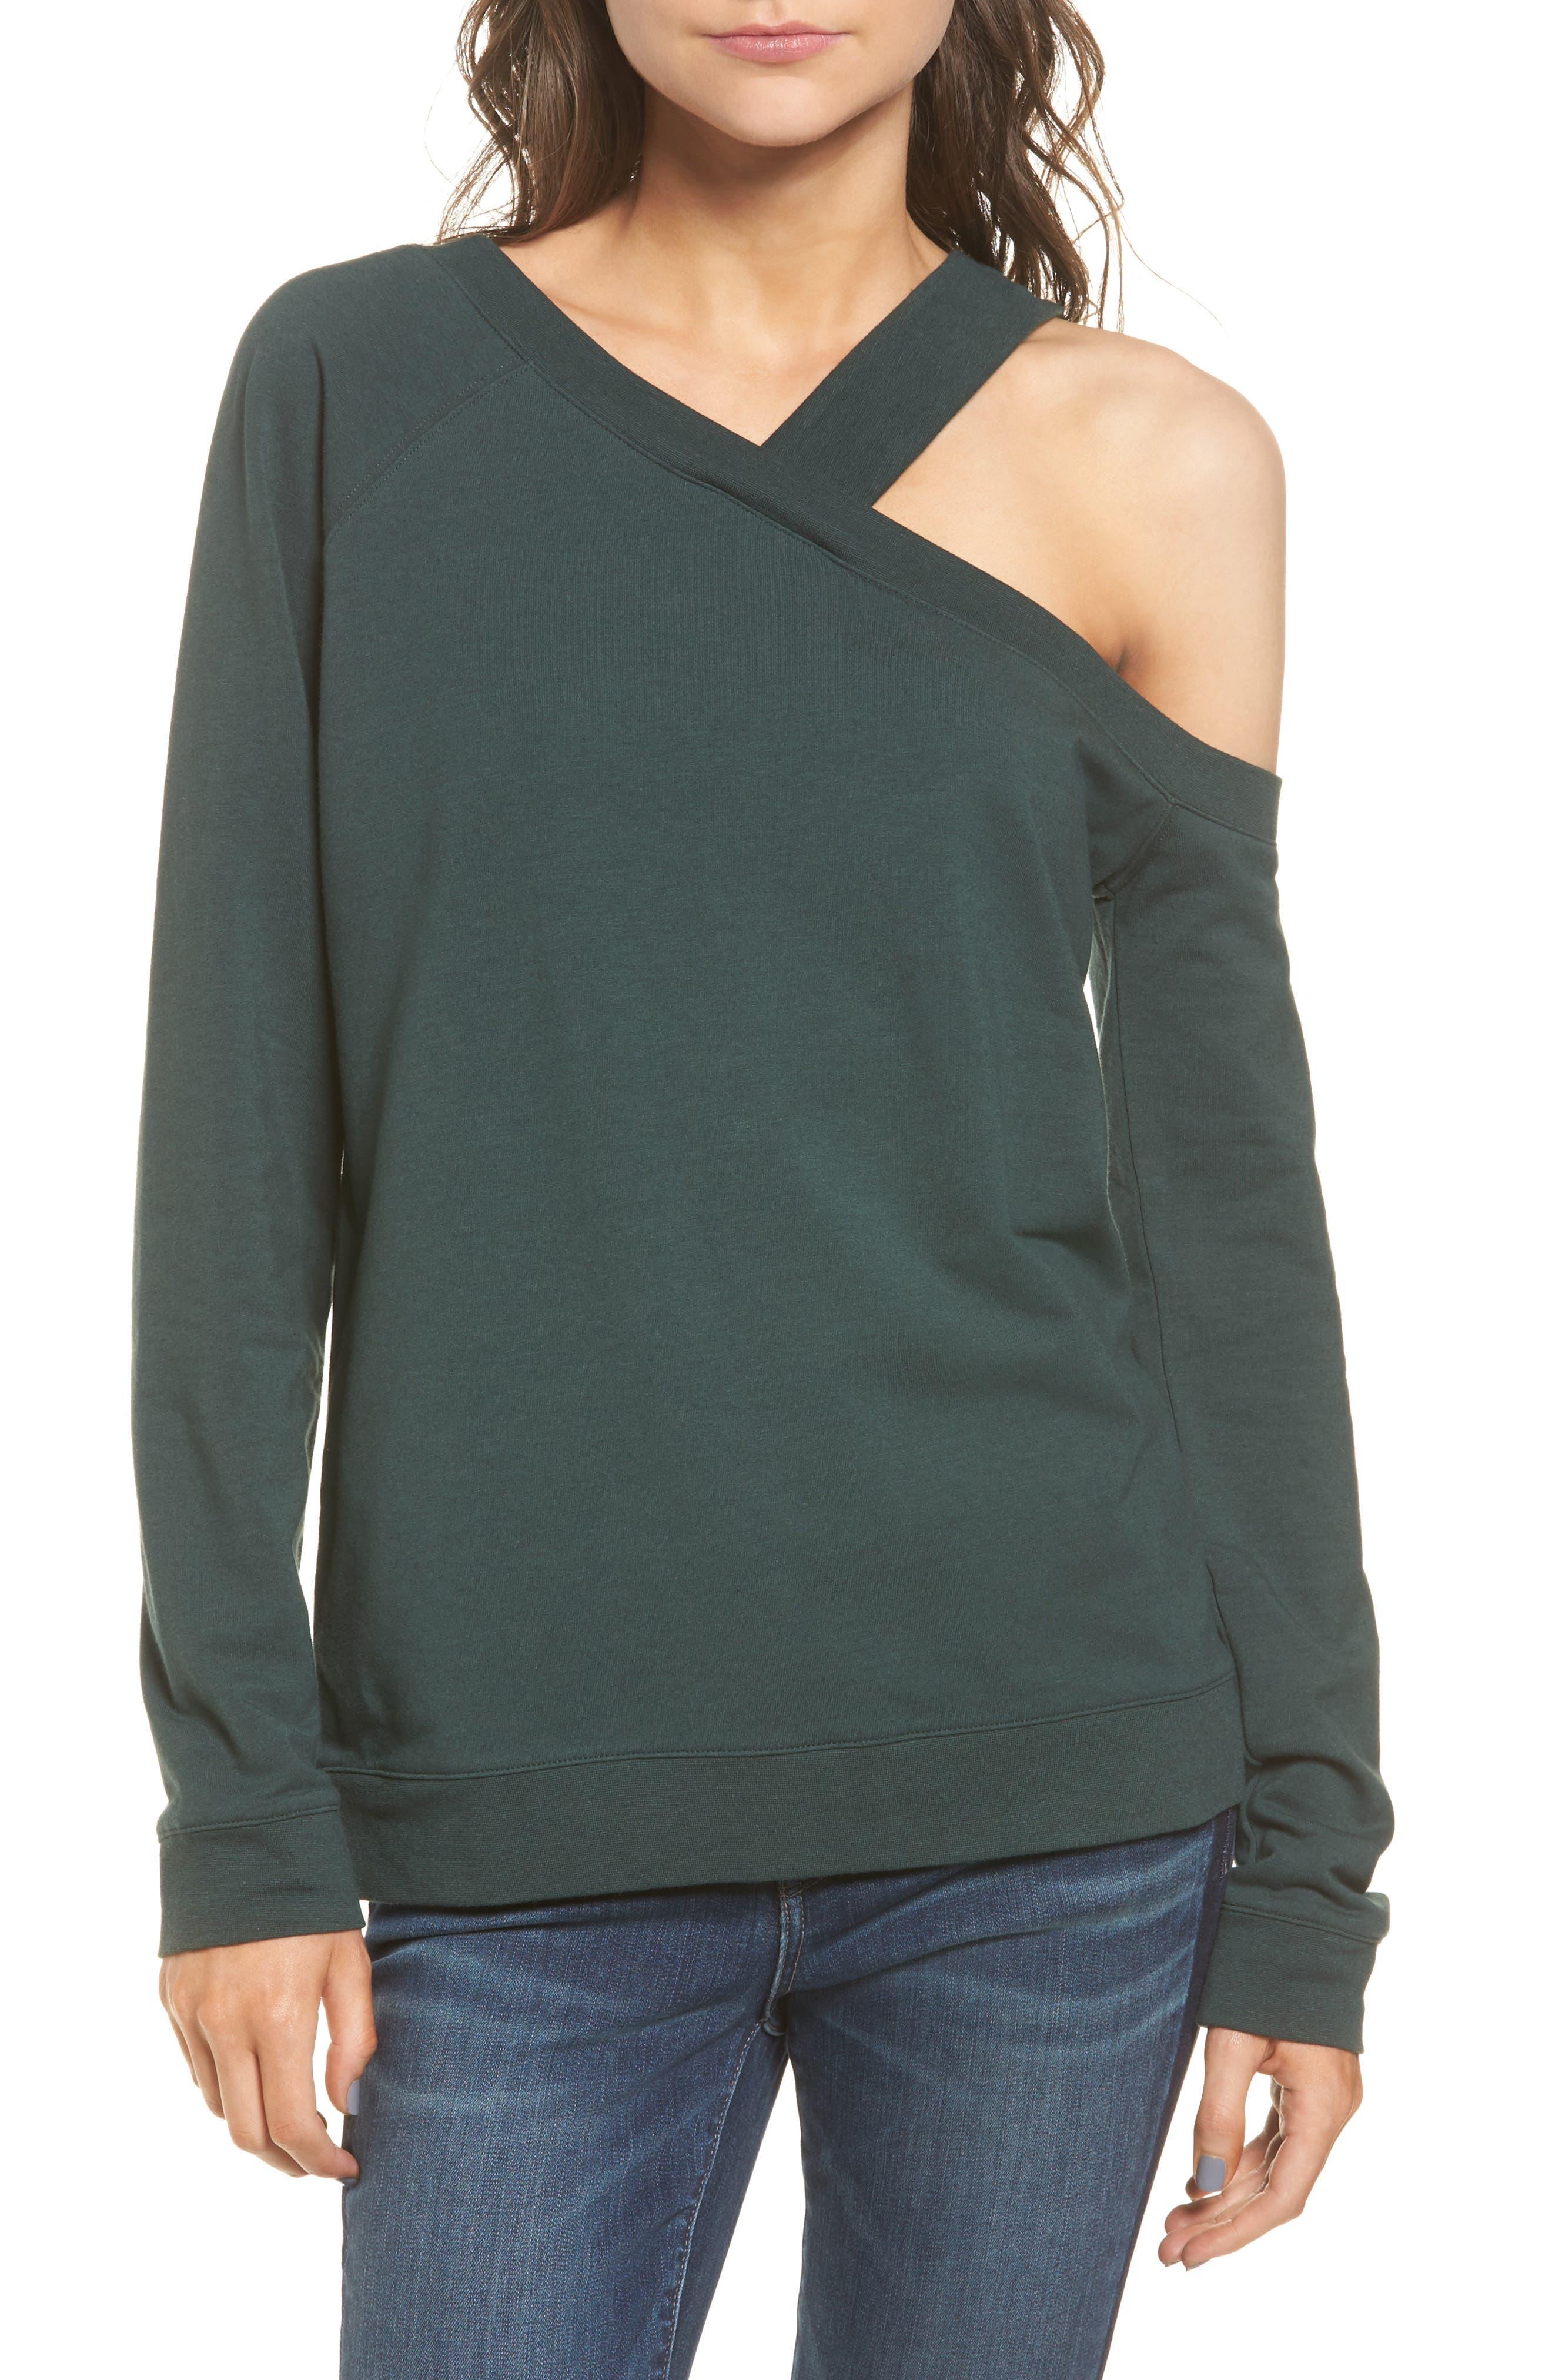 Alternate Image 1 Selected - Treasure & Bond Asymmetrical Sweatshirt